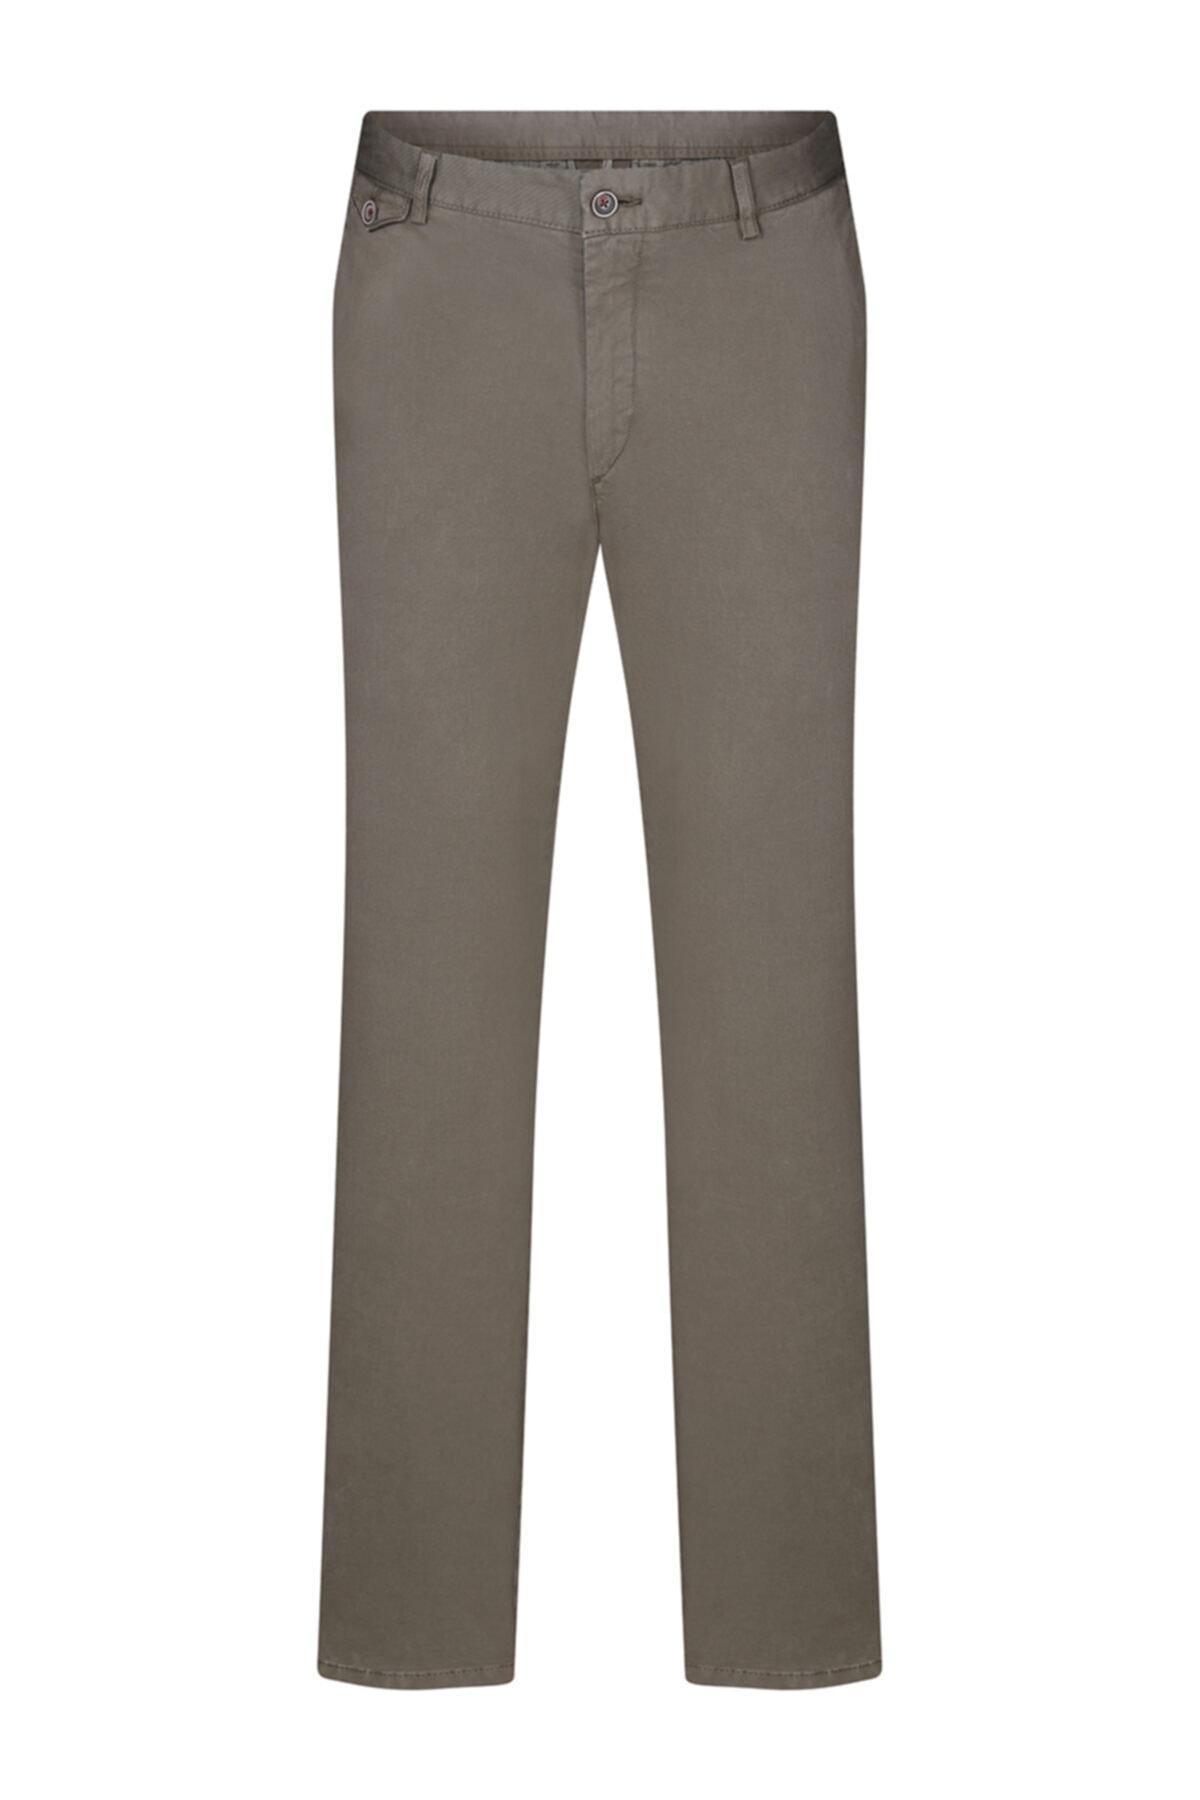 W Collection Haki Spor Pantolon 1